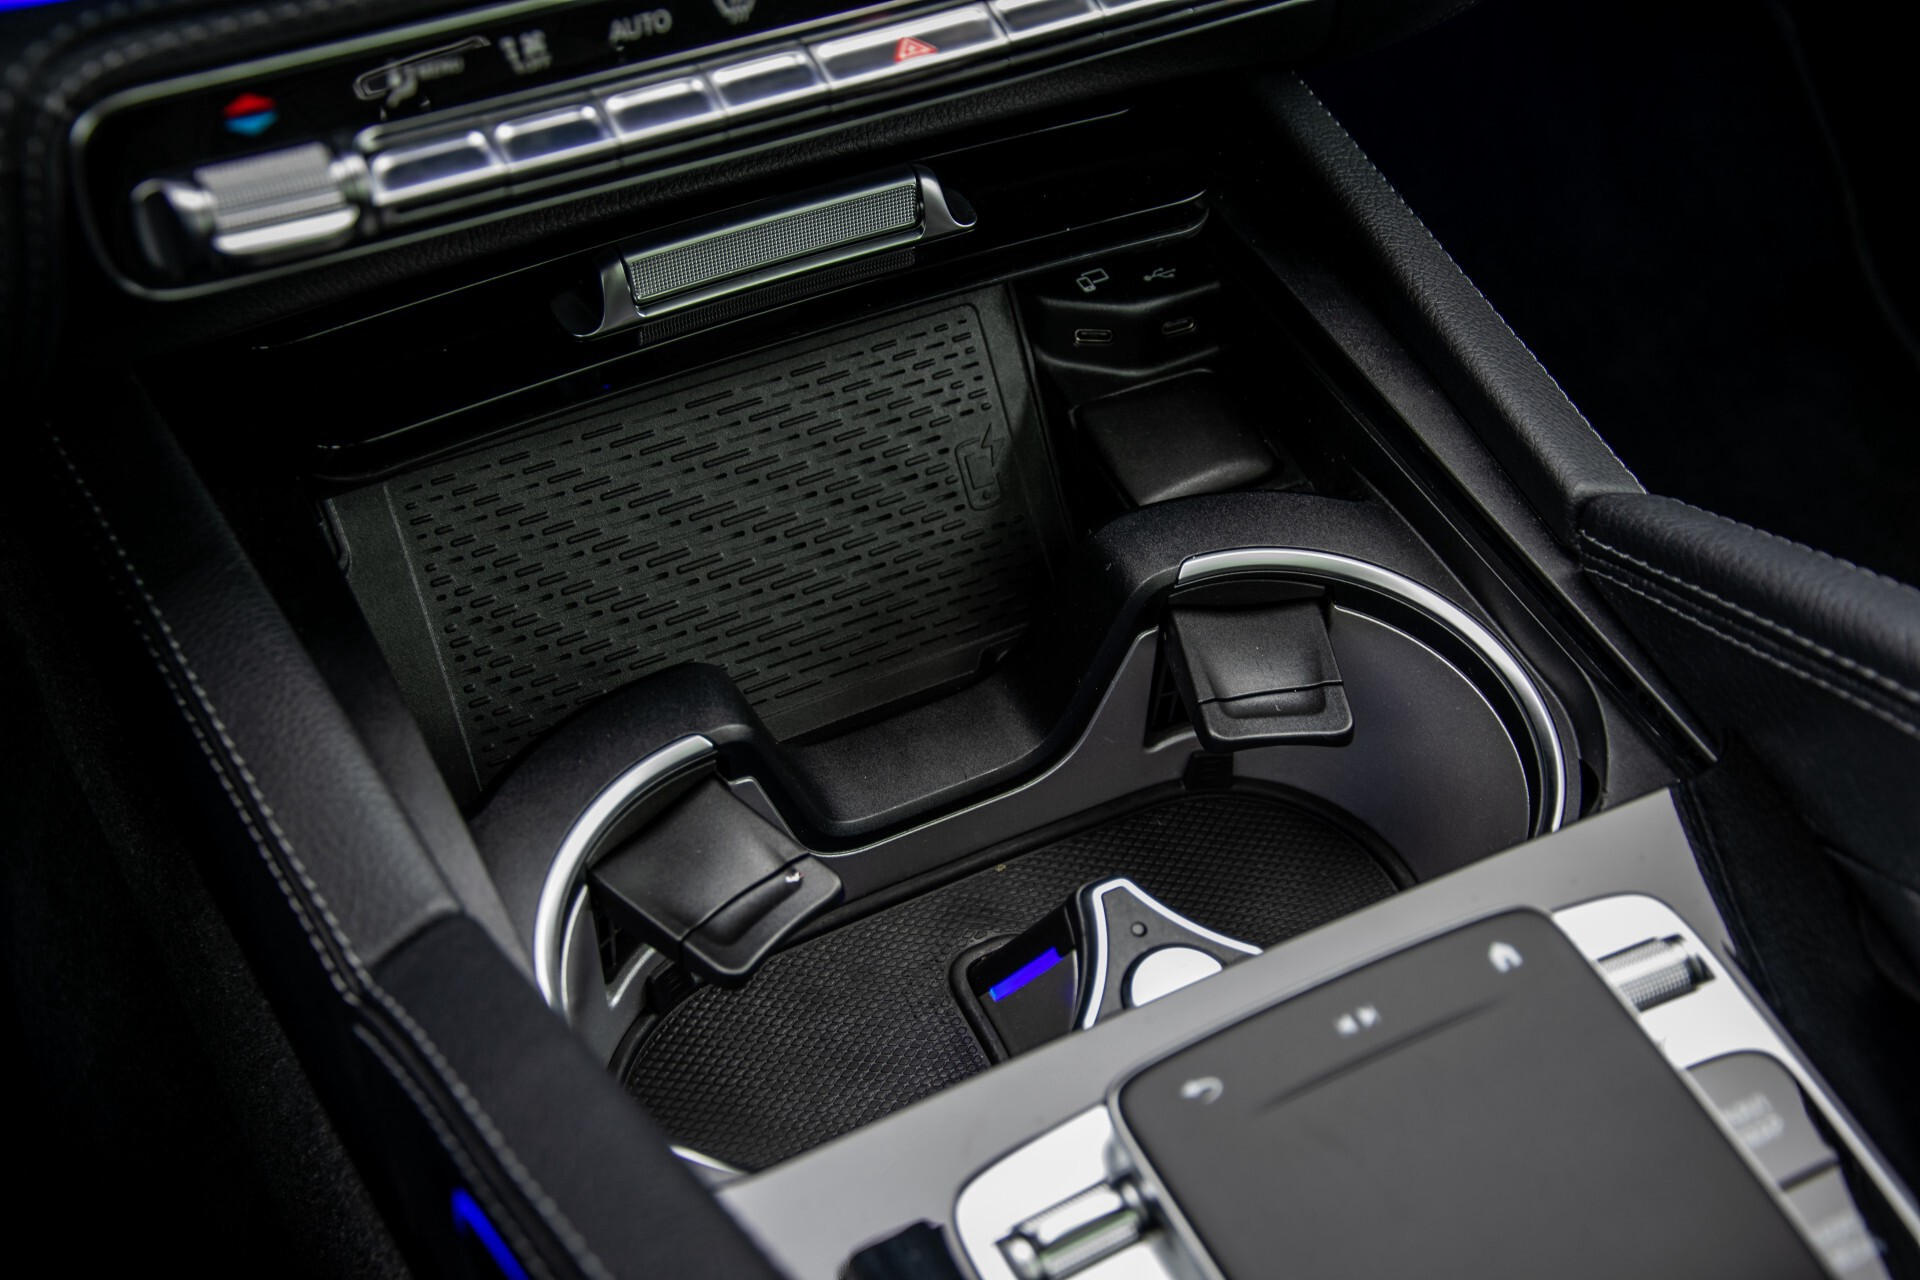 Mercedes-Benz GLE 450 4-M 7-Persoons AMG Massage/Rij-assist/Keyless/TV/360/Night/Trekhaak Aut9 Foto 61